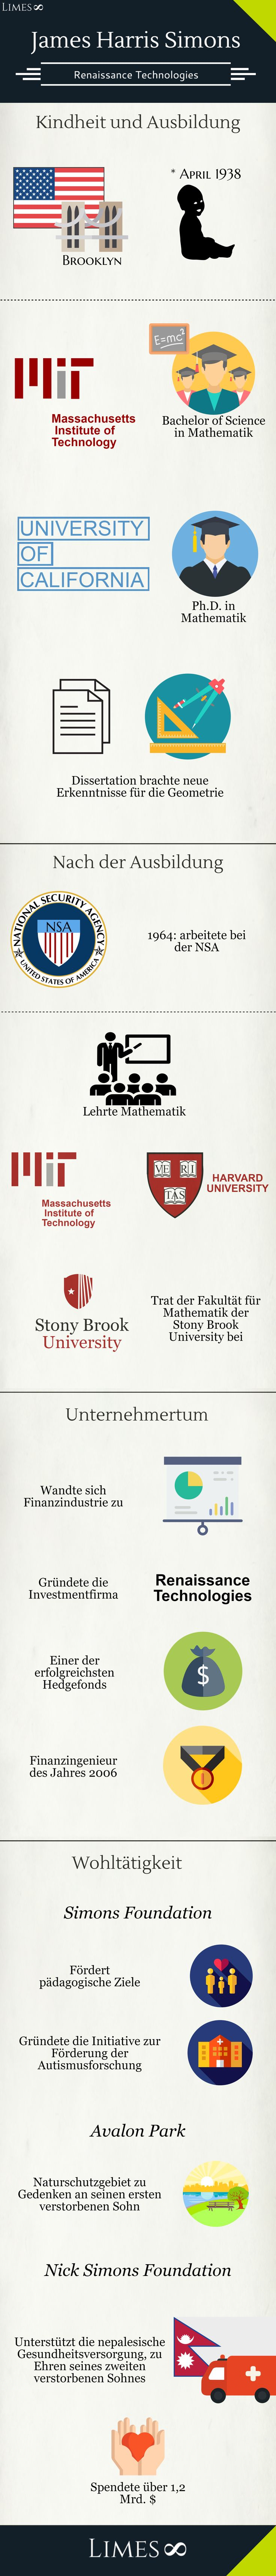 "Infografik James Harris Simons: ""Finanzingenieur des Jahres 2006"". Vorsitzender der Renaissance Technologies."